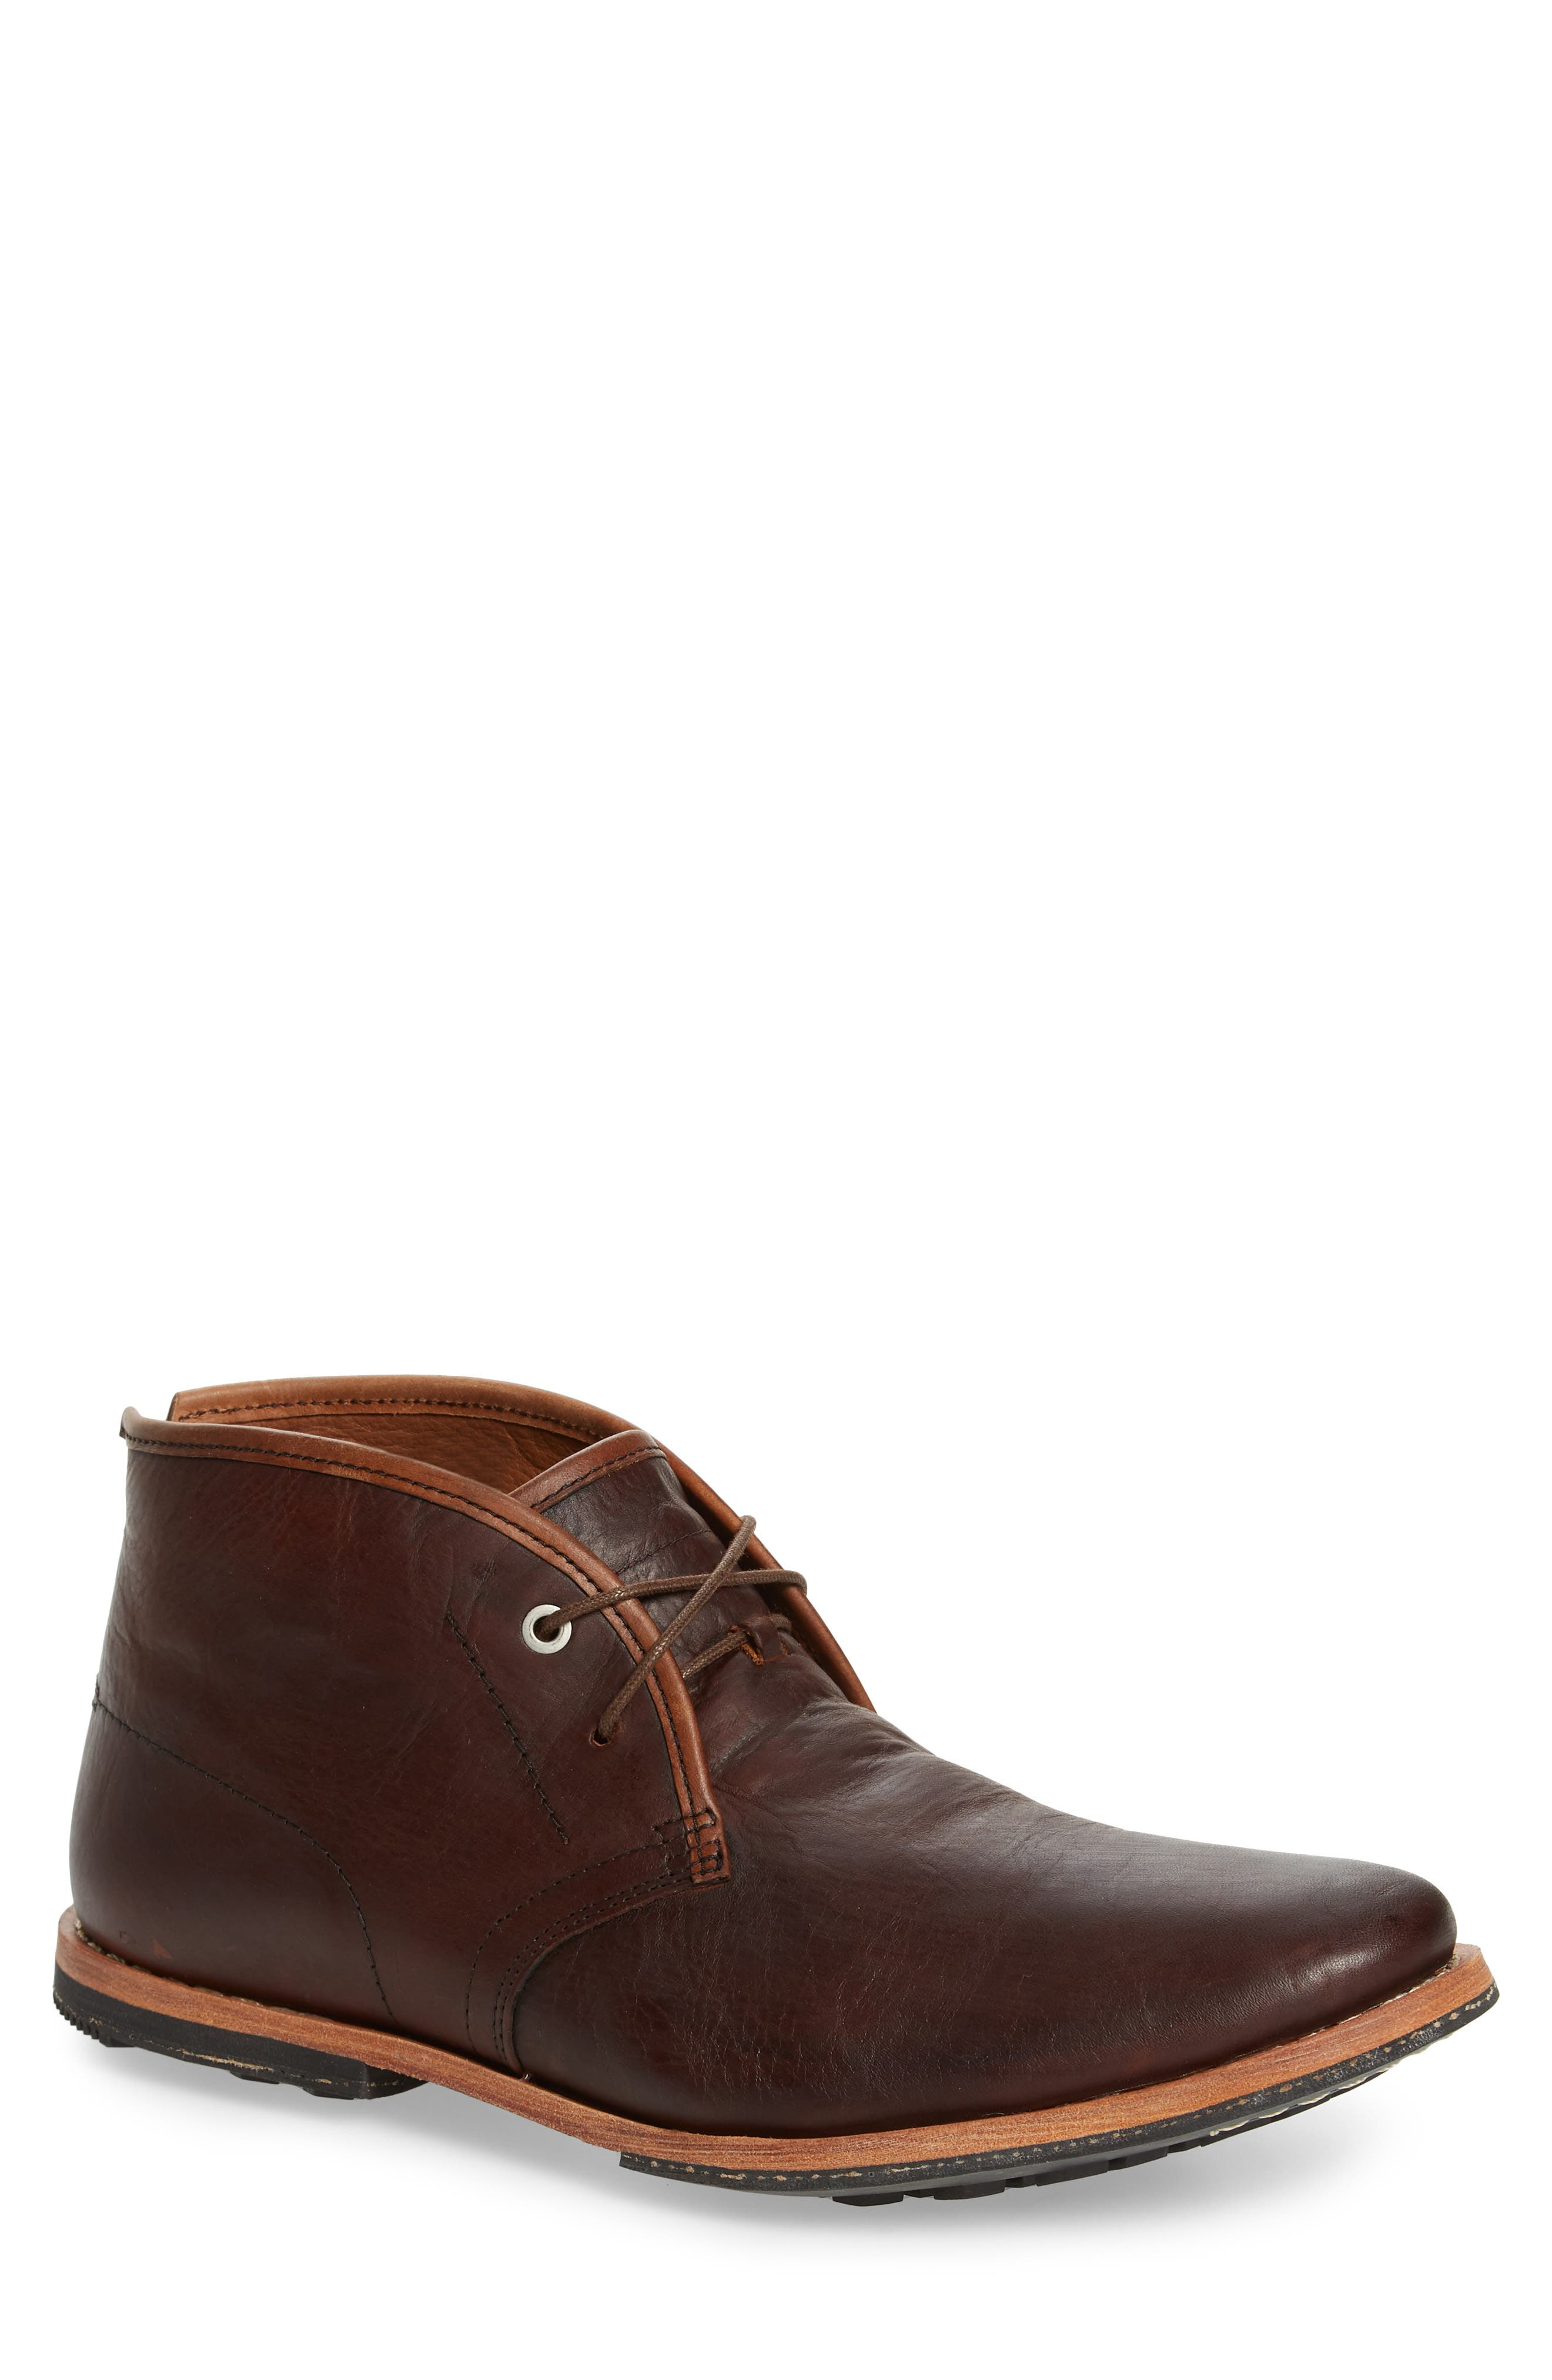 Men's Shoes Sale \u0026 Clearance | Nordstrom